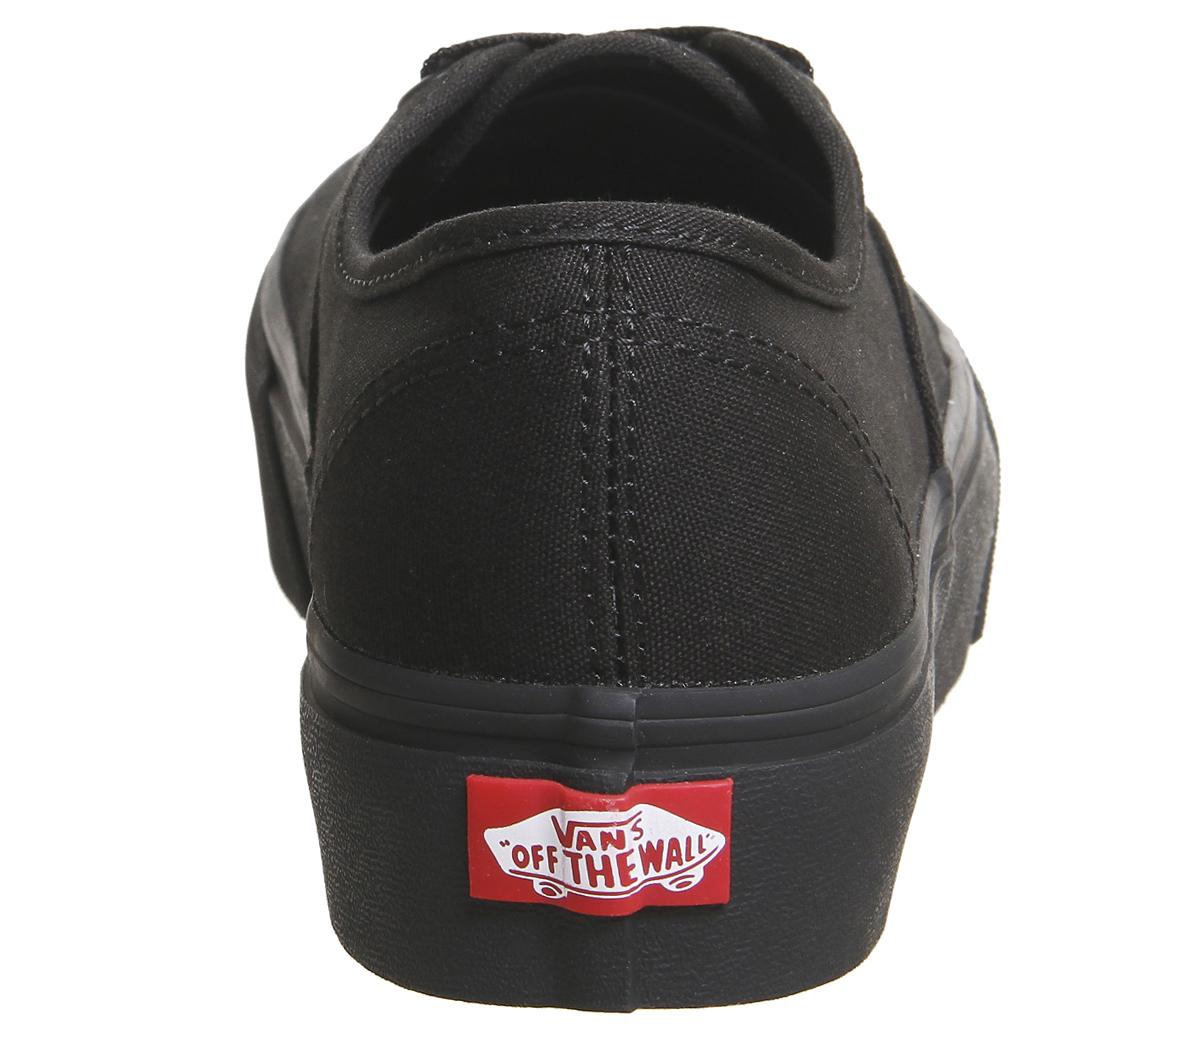 Damenschuhe Platform Vans Authentic Platform Damenschuhe Trainers BLACK Trainers Schuhes cf532c